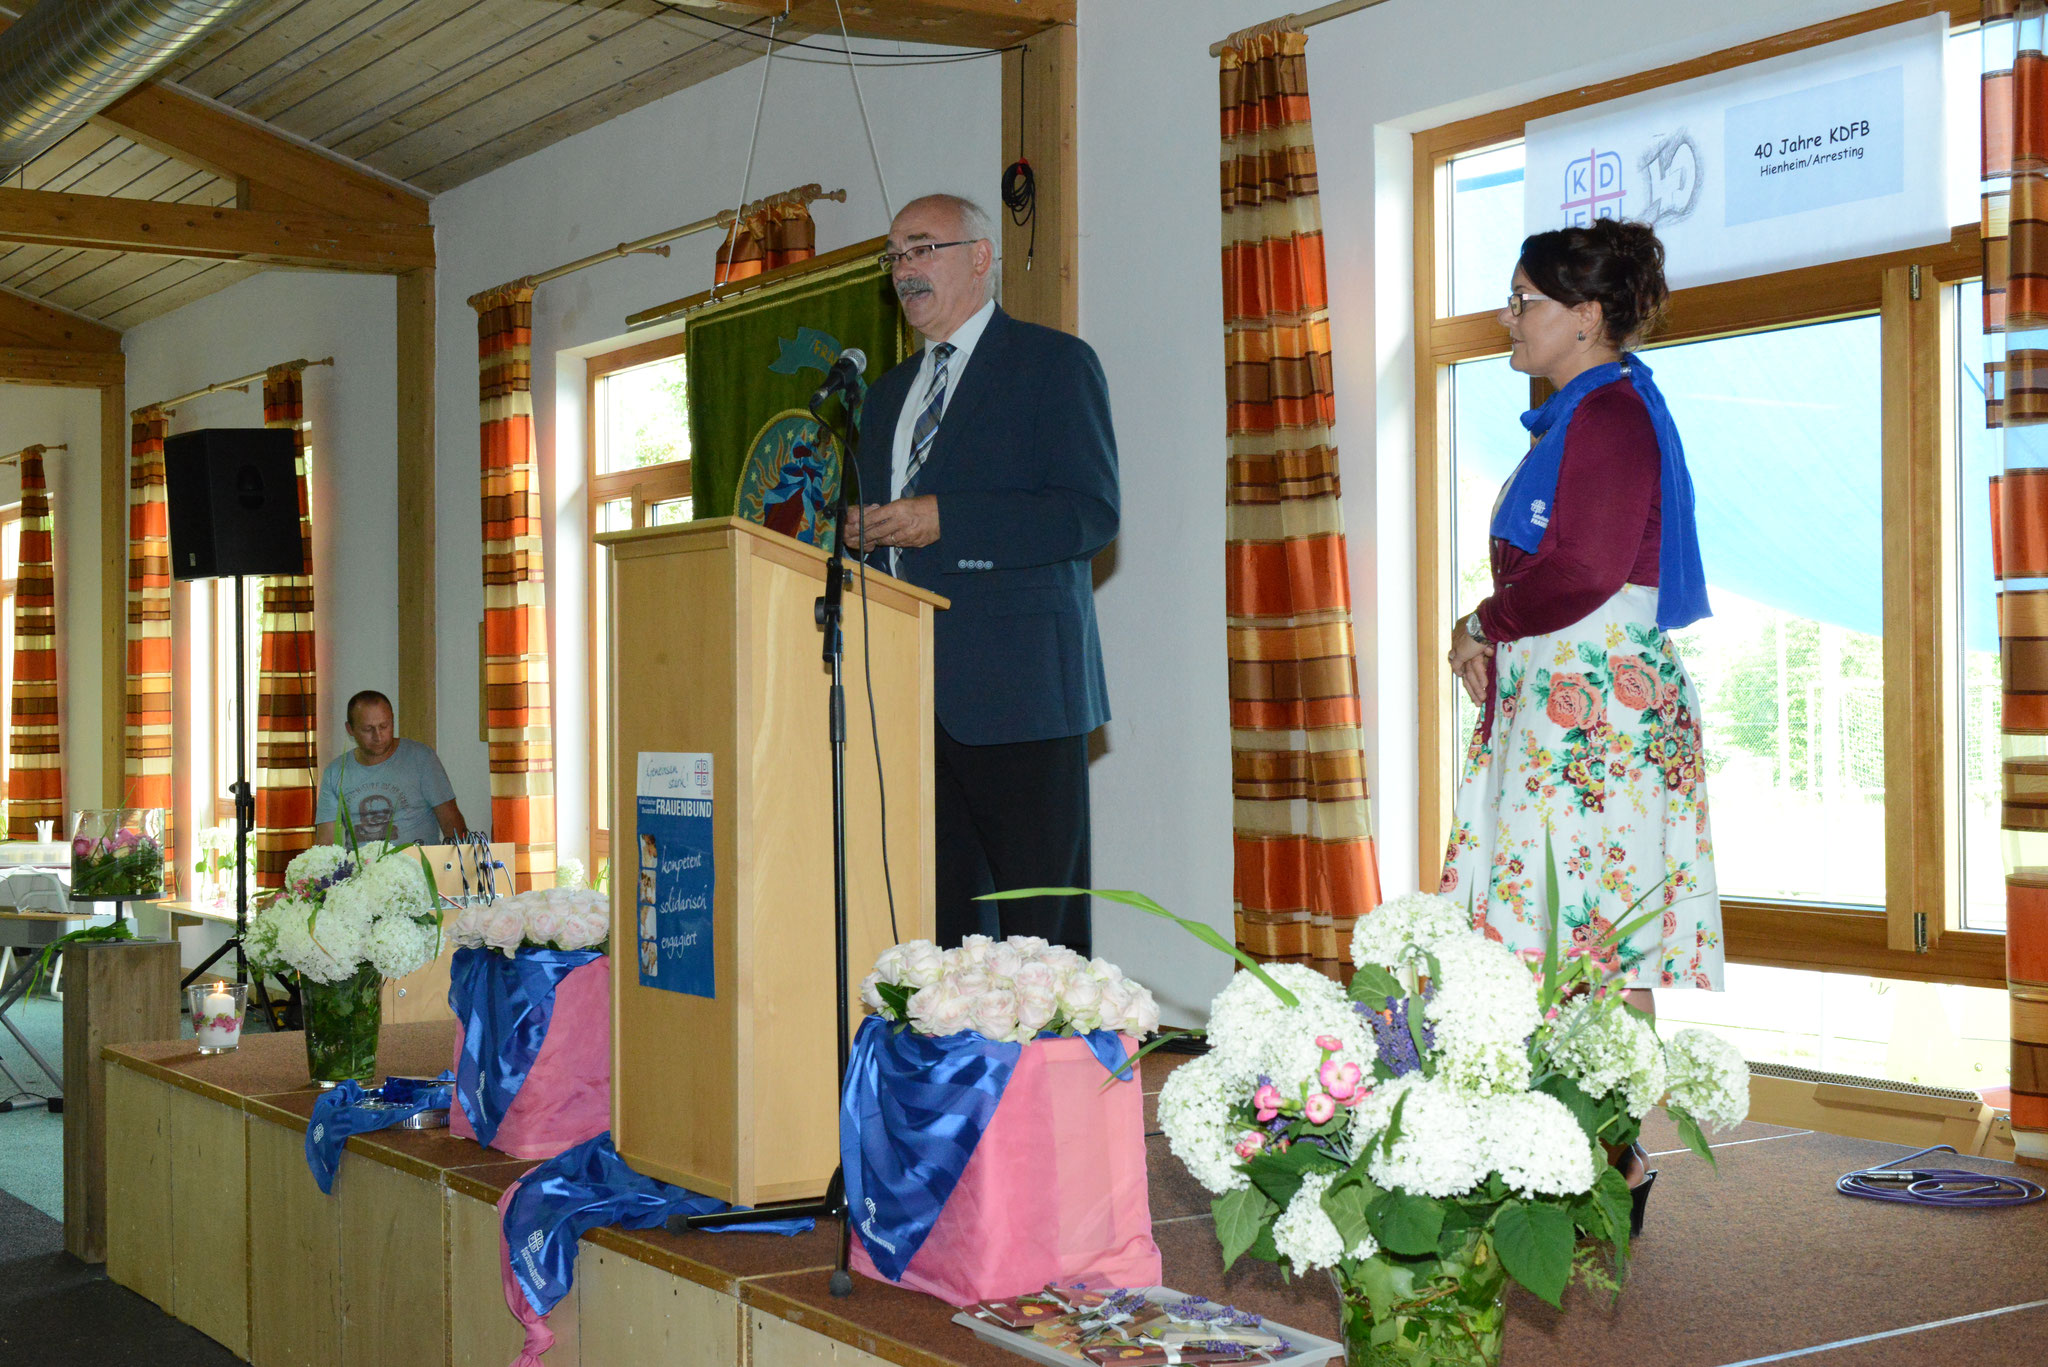 Bürgermeister Thomas Reimer und Teammitglied Elisabeth Ullinger